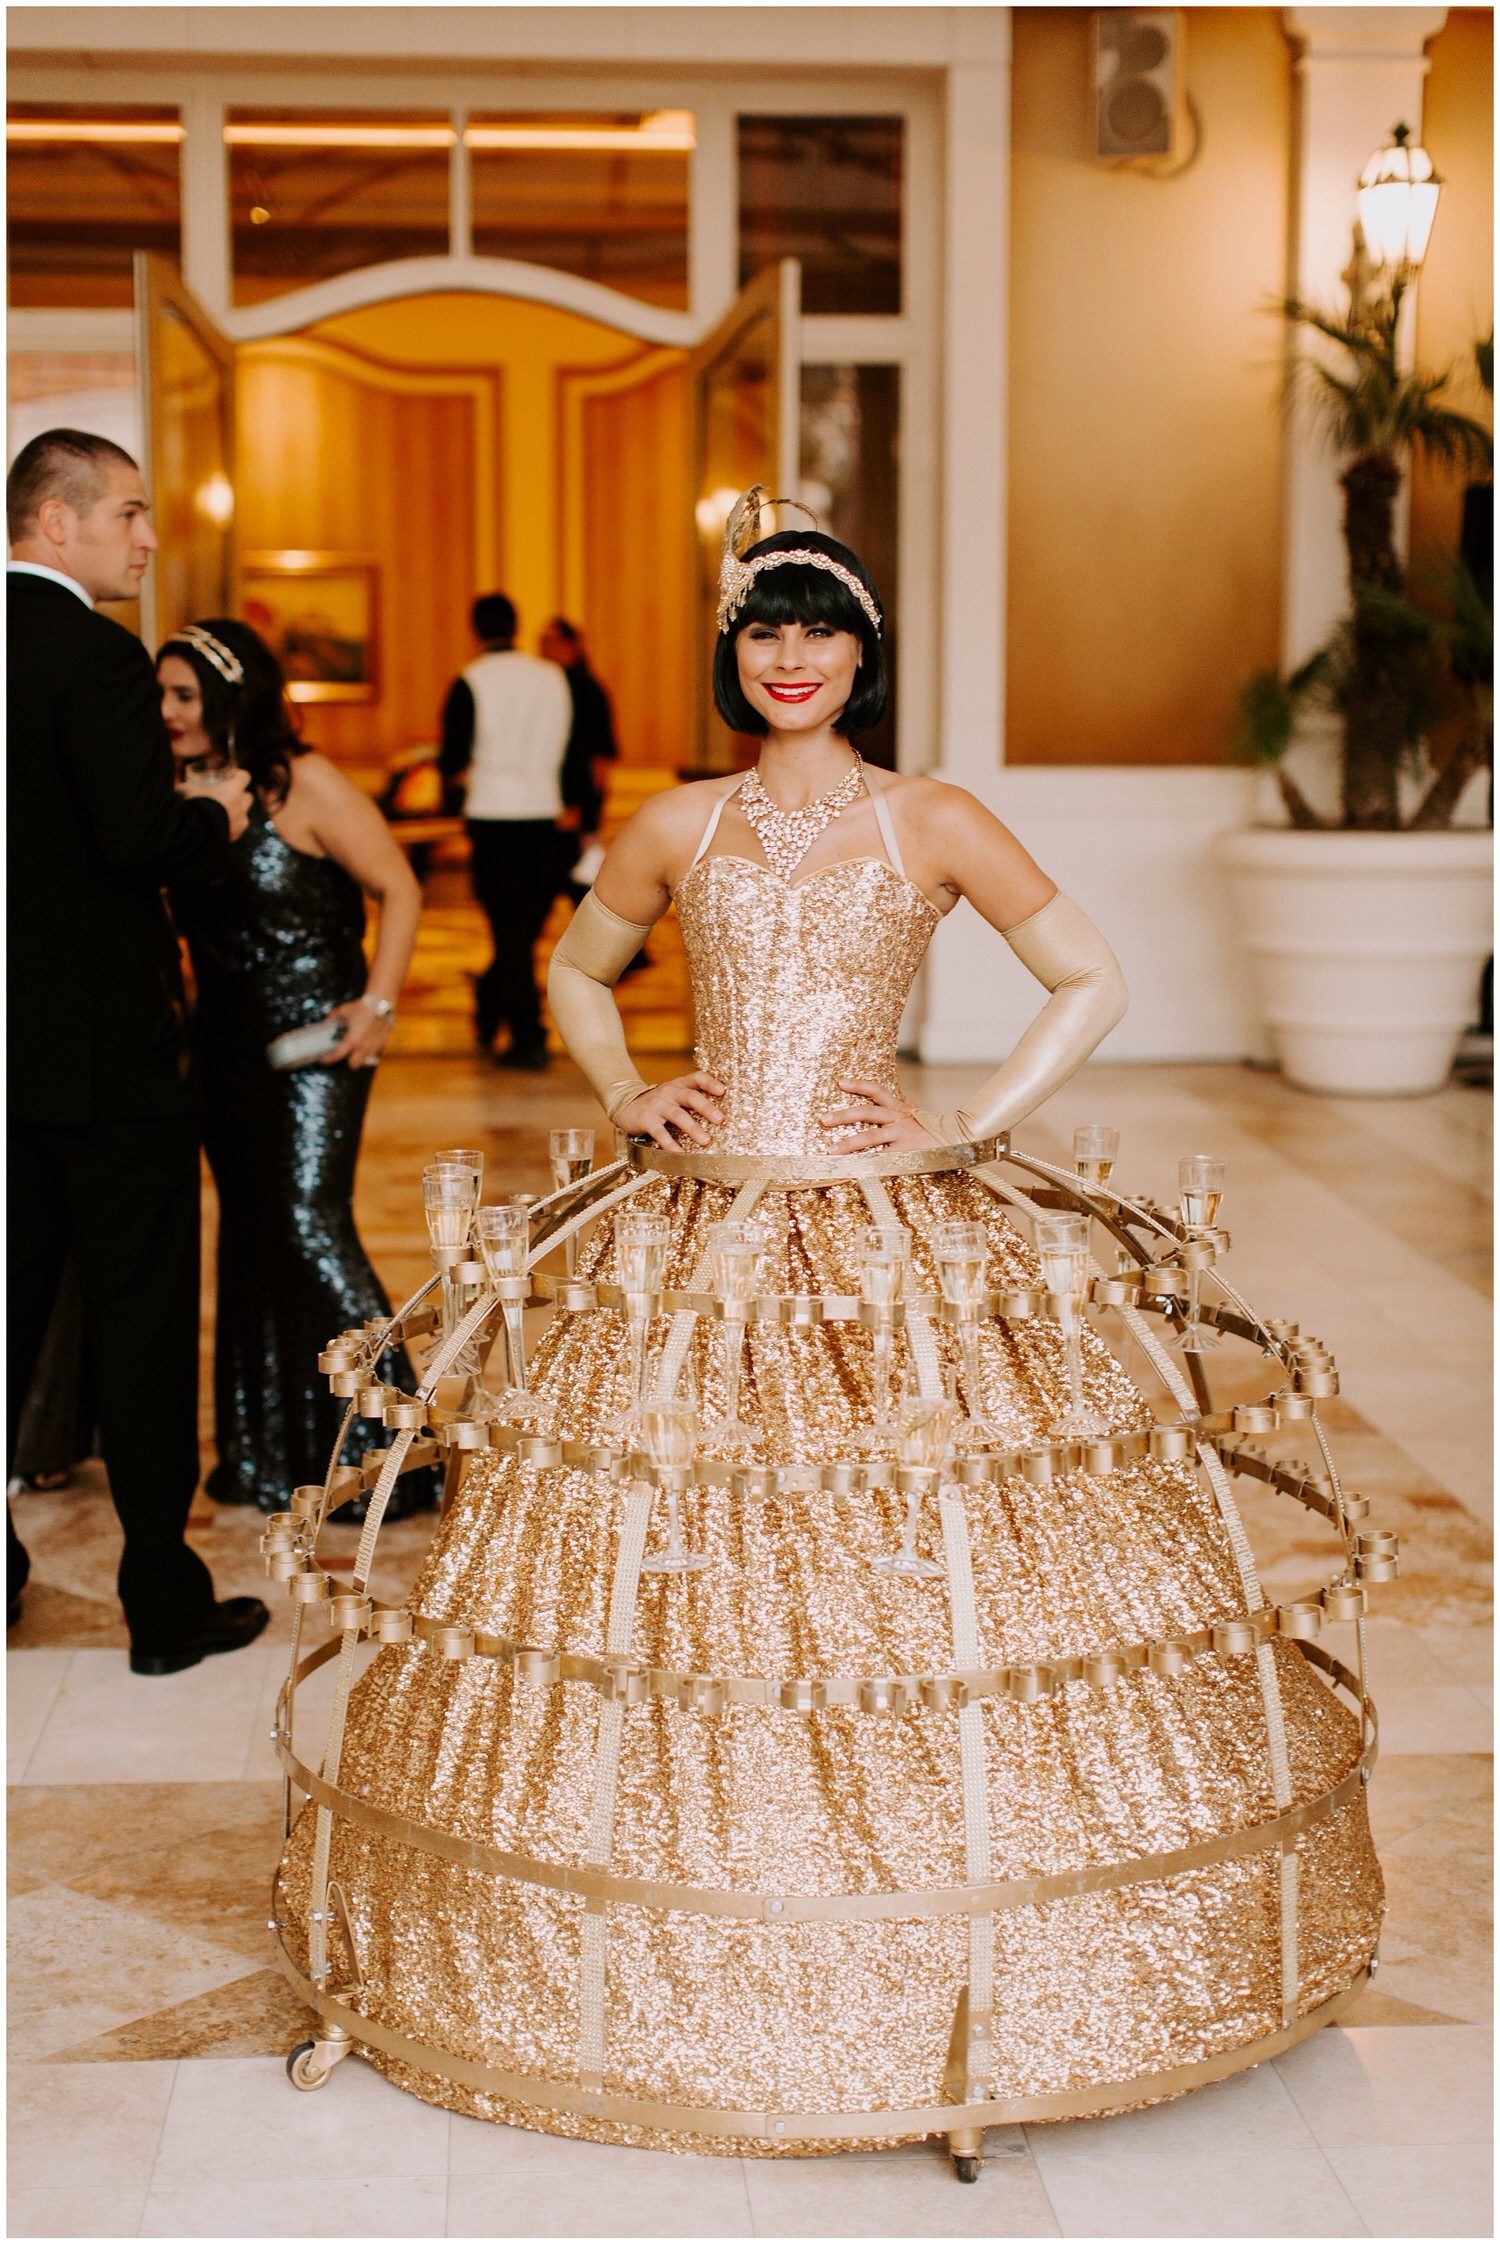 champagne girl vegas at wedding reception